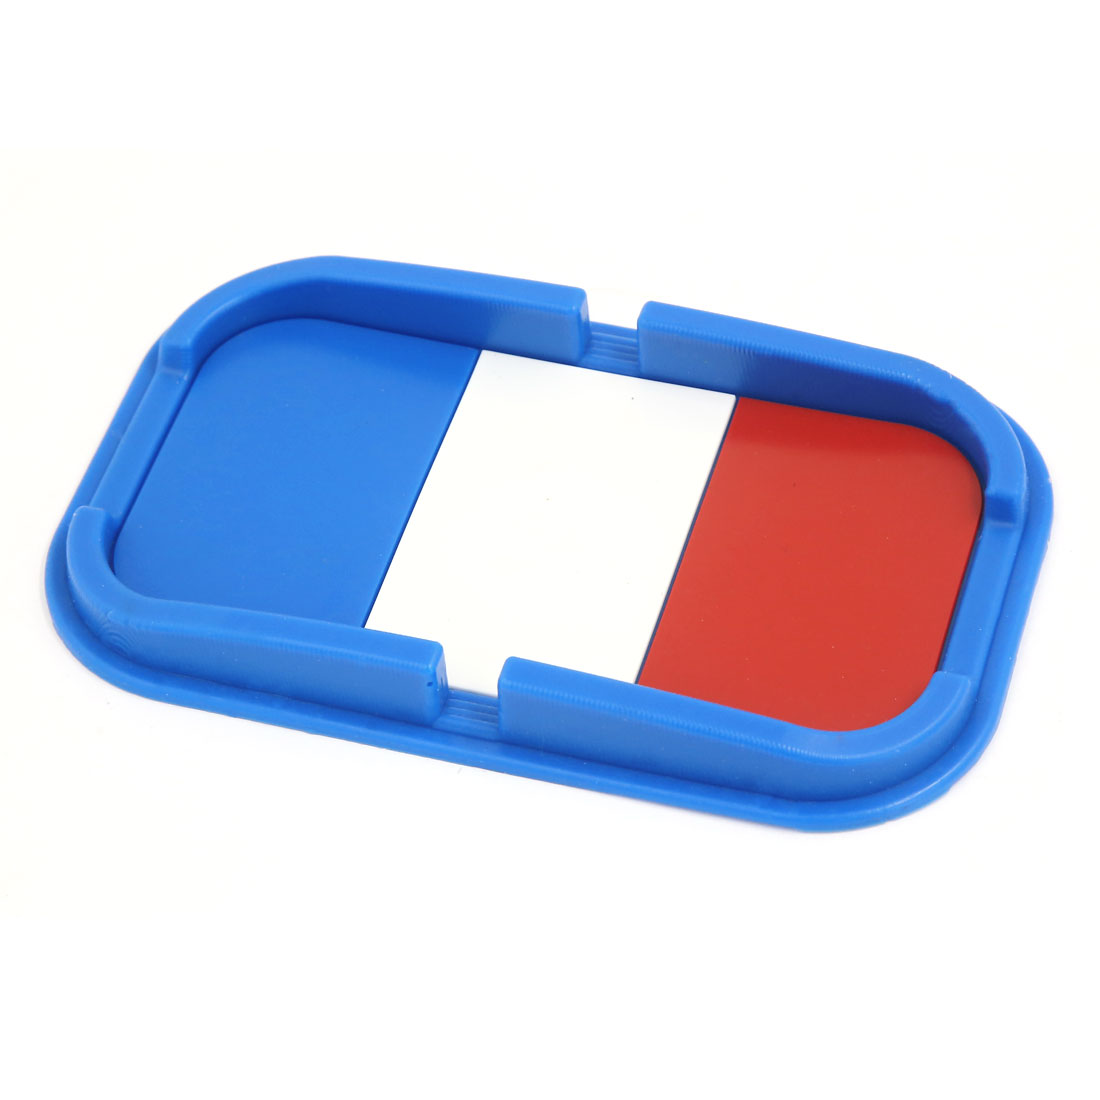 Car Automobile Navigation Rubber Stripe Pattern Non-Slip Pad Mat Holder